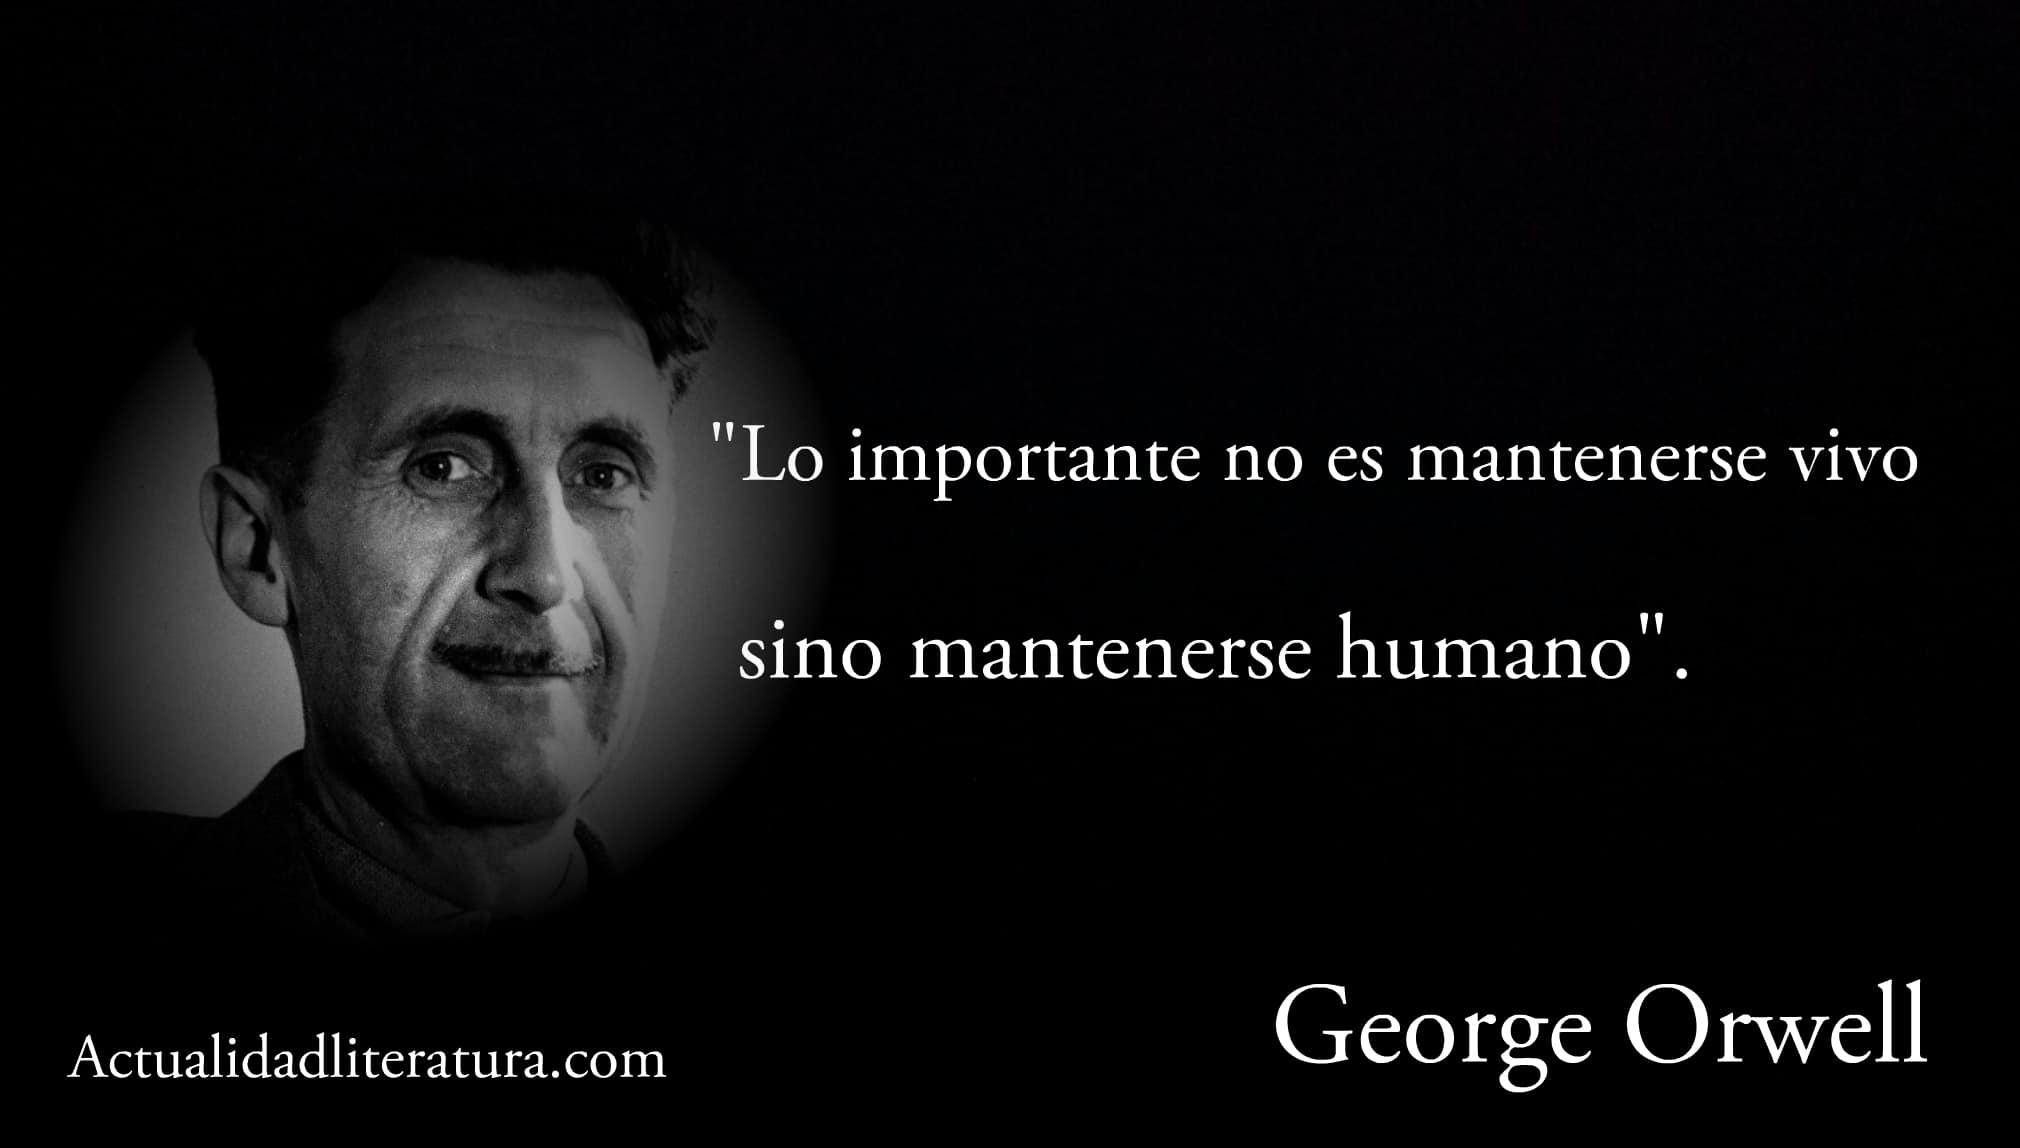 Frase de George Orwell.